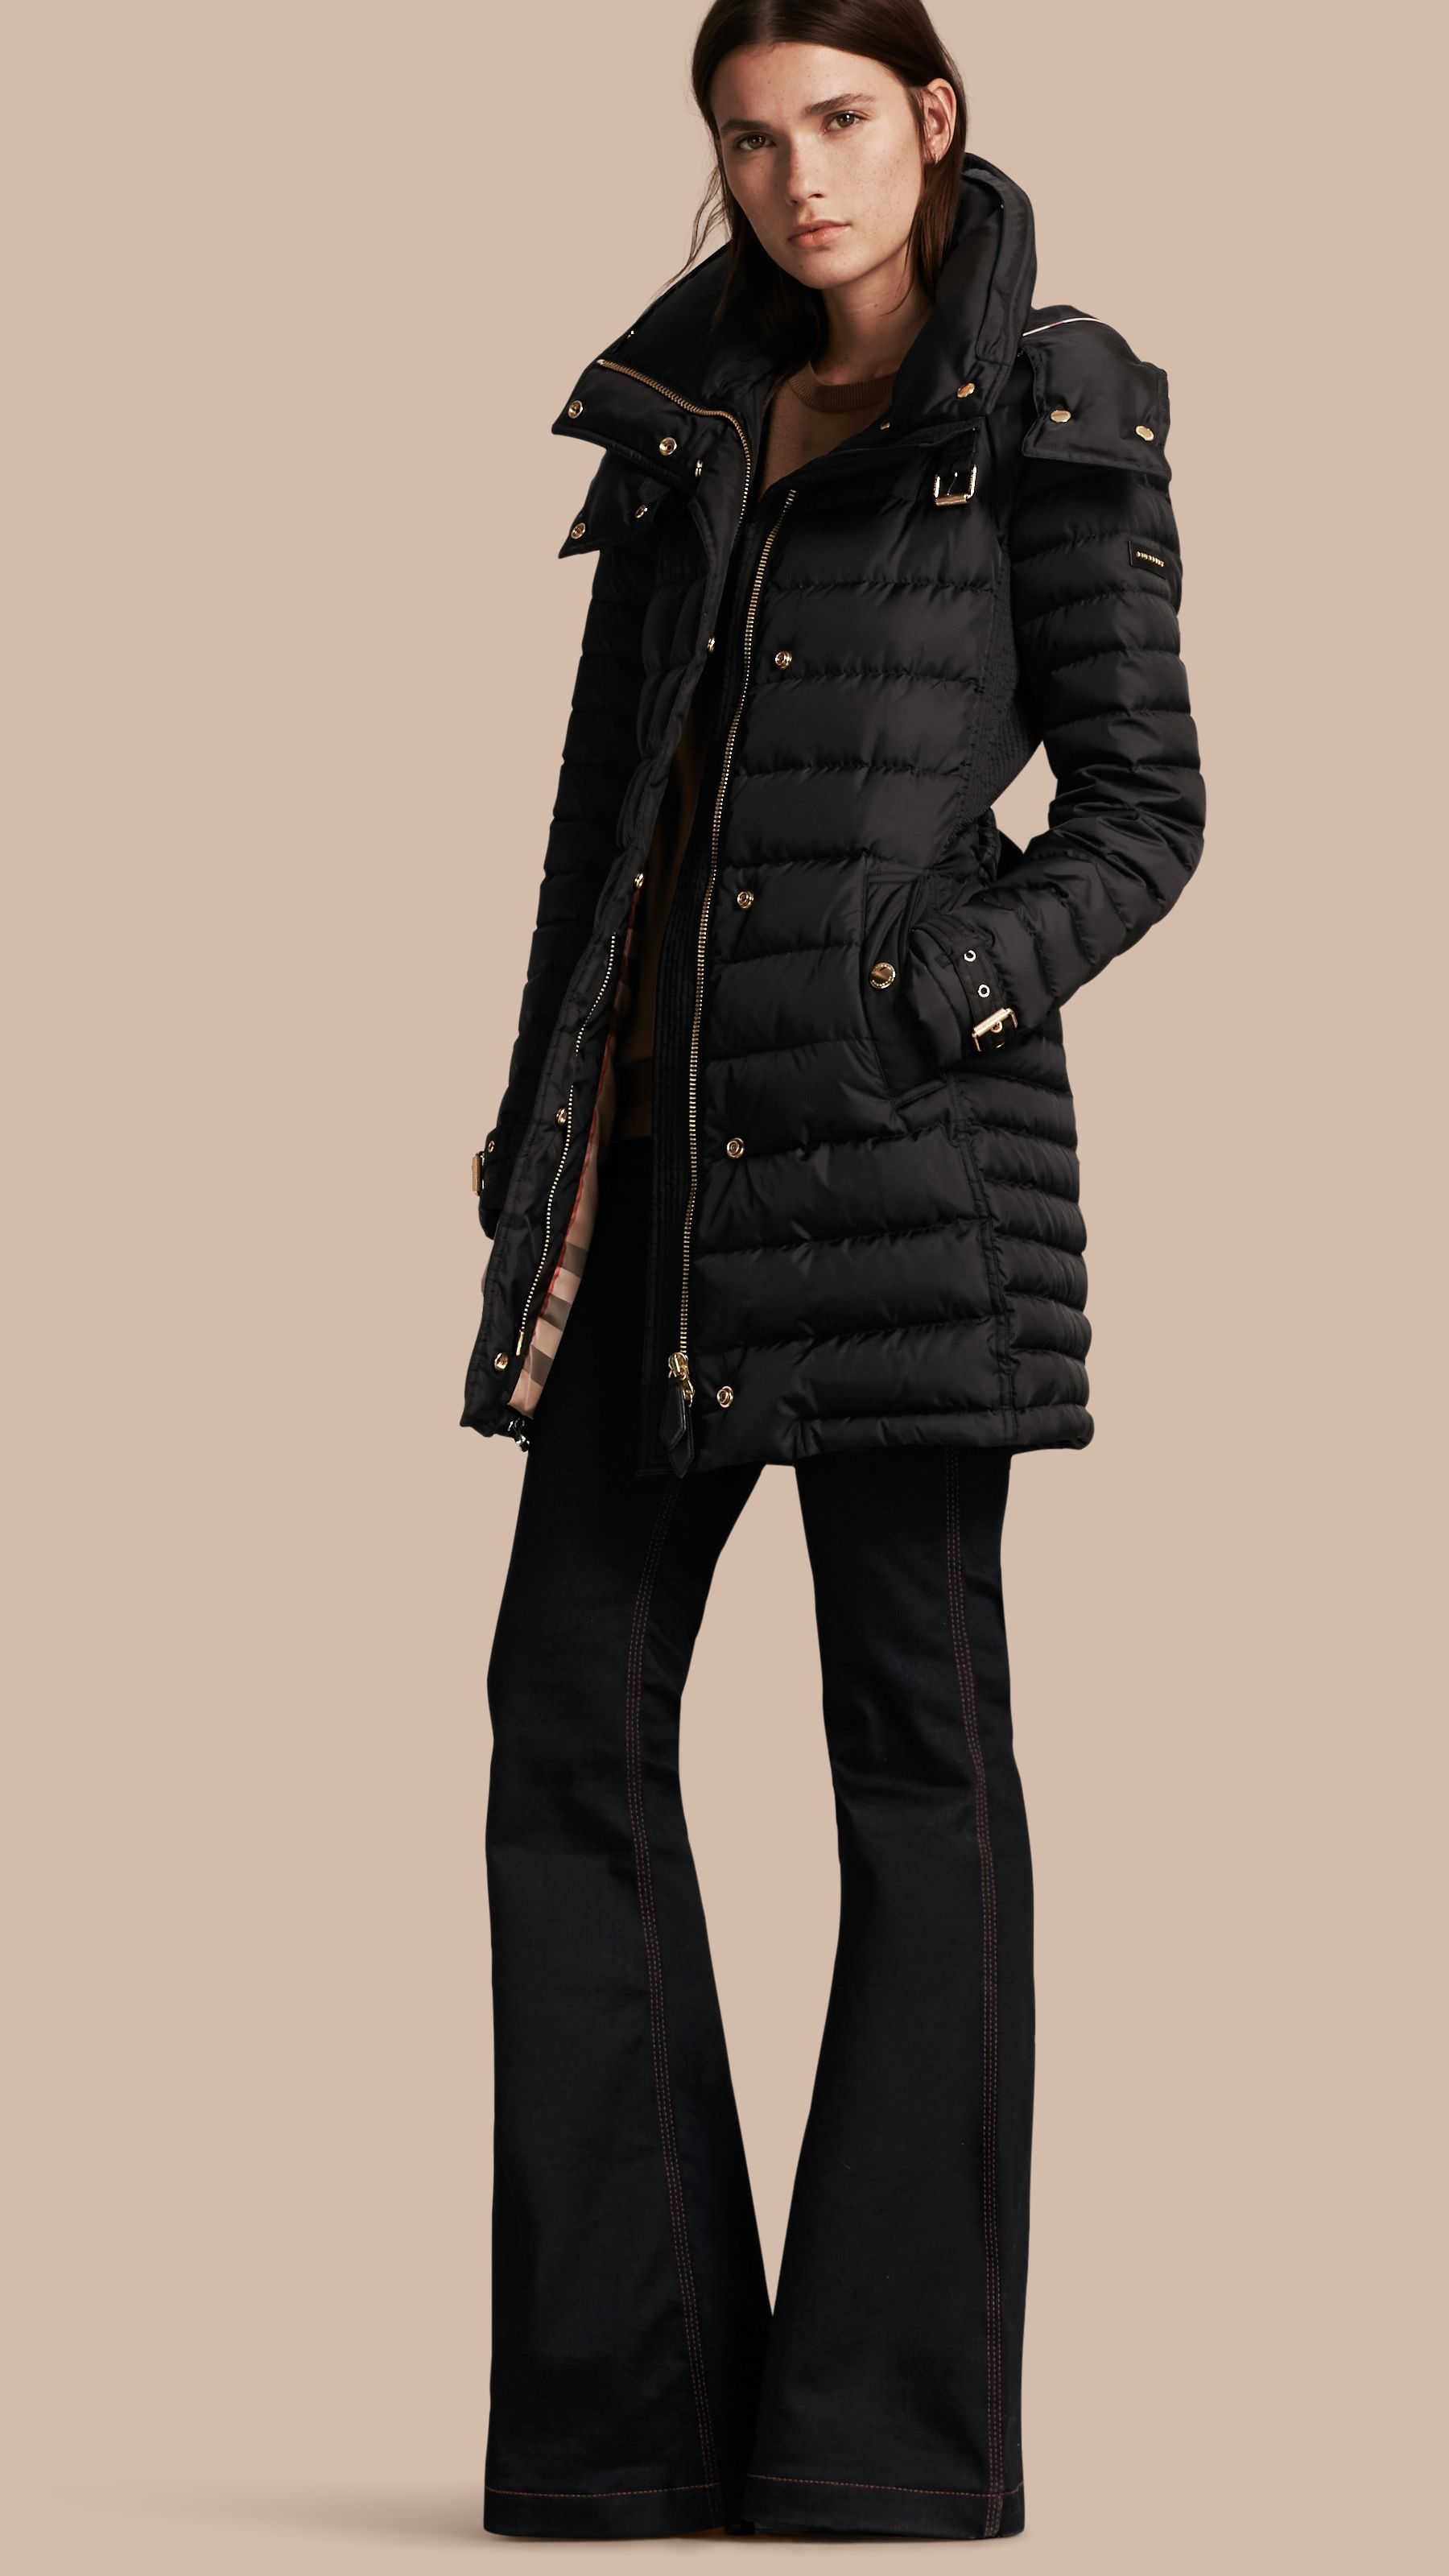 Down Filled Puffer Coat With Packaway Hood In Black Women Burberry Puffer Coat Coat Ladies Tops Fashion